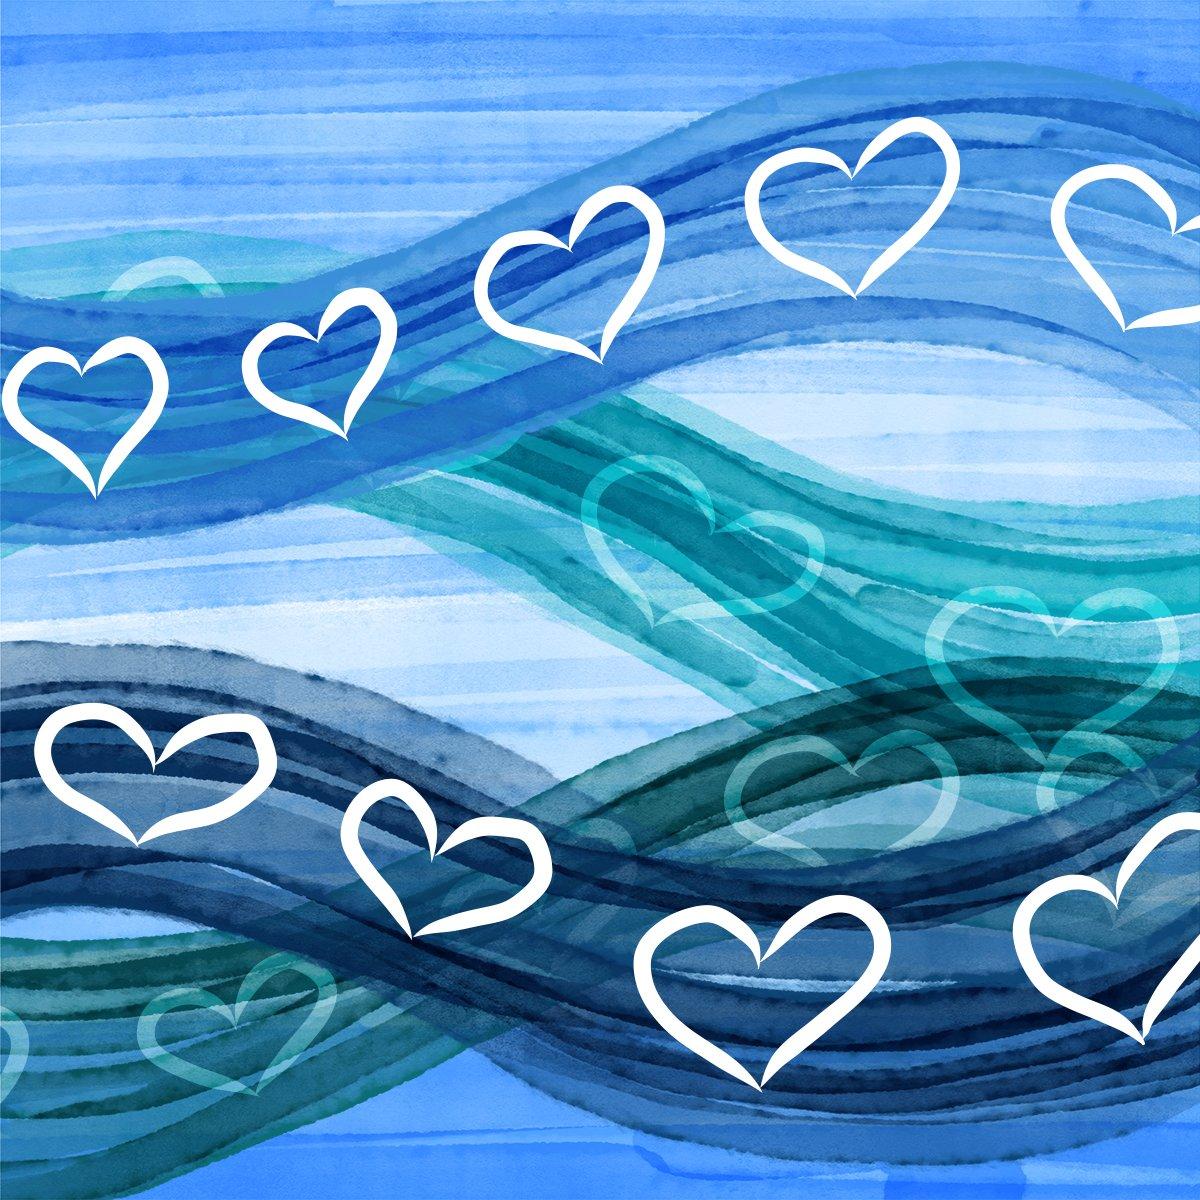 Hearts flowing across blue waves